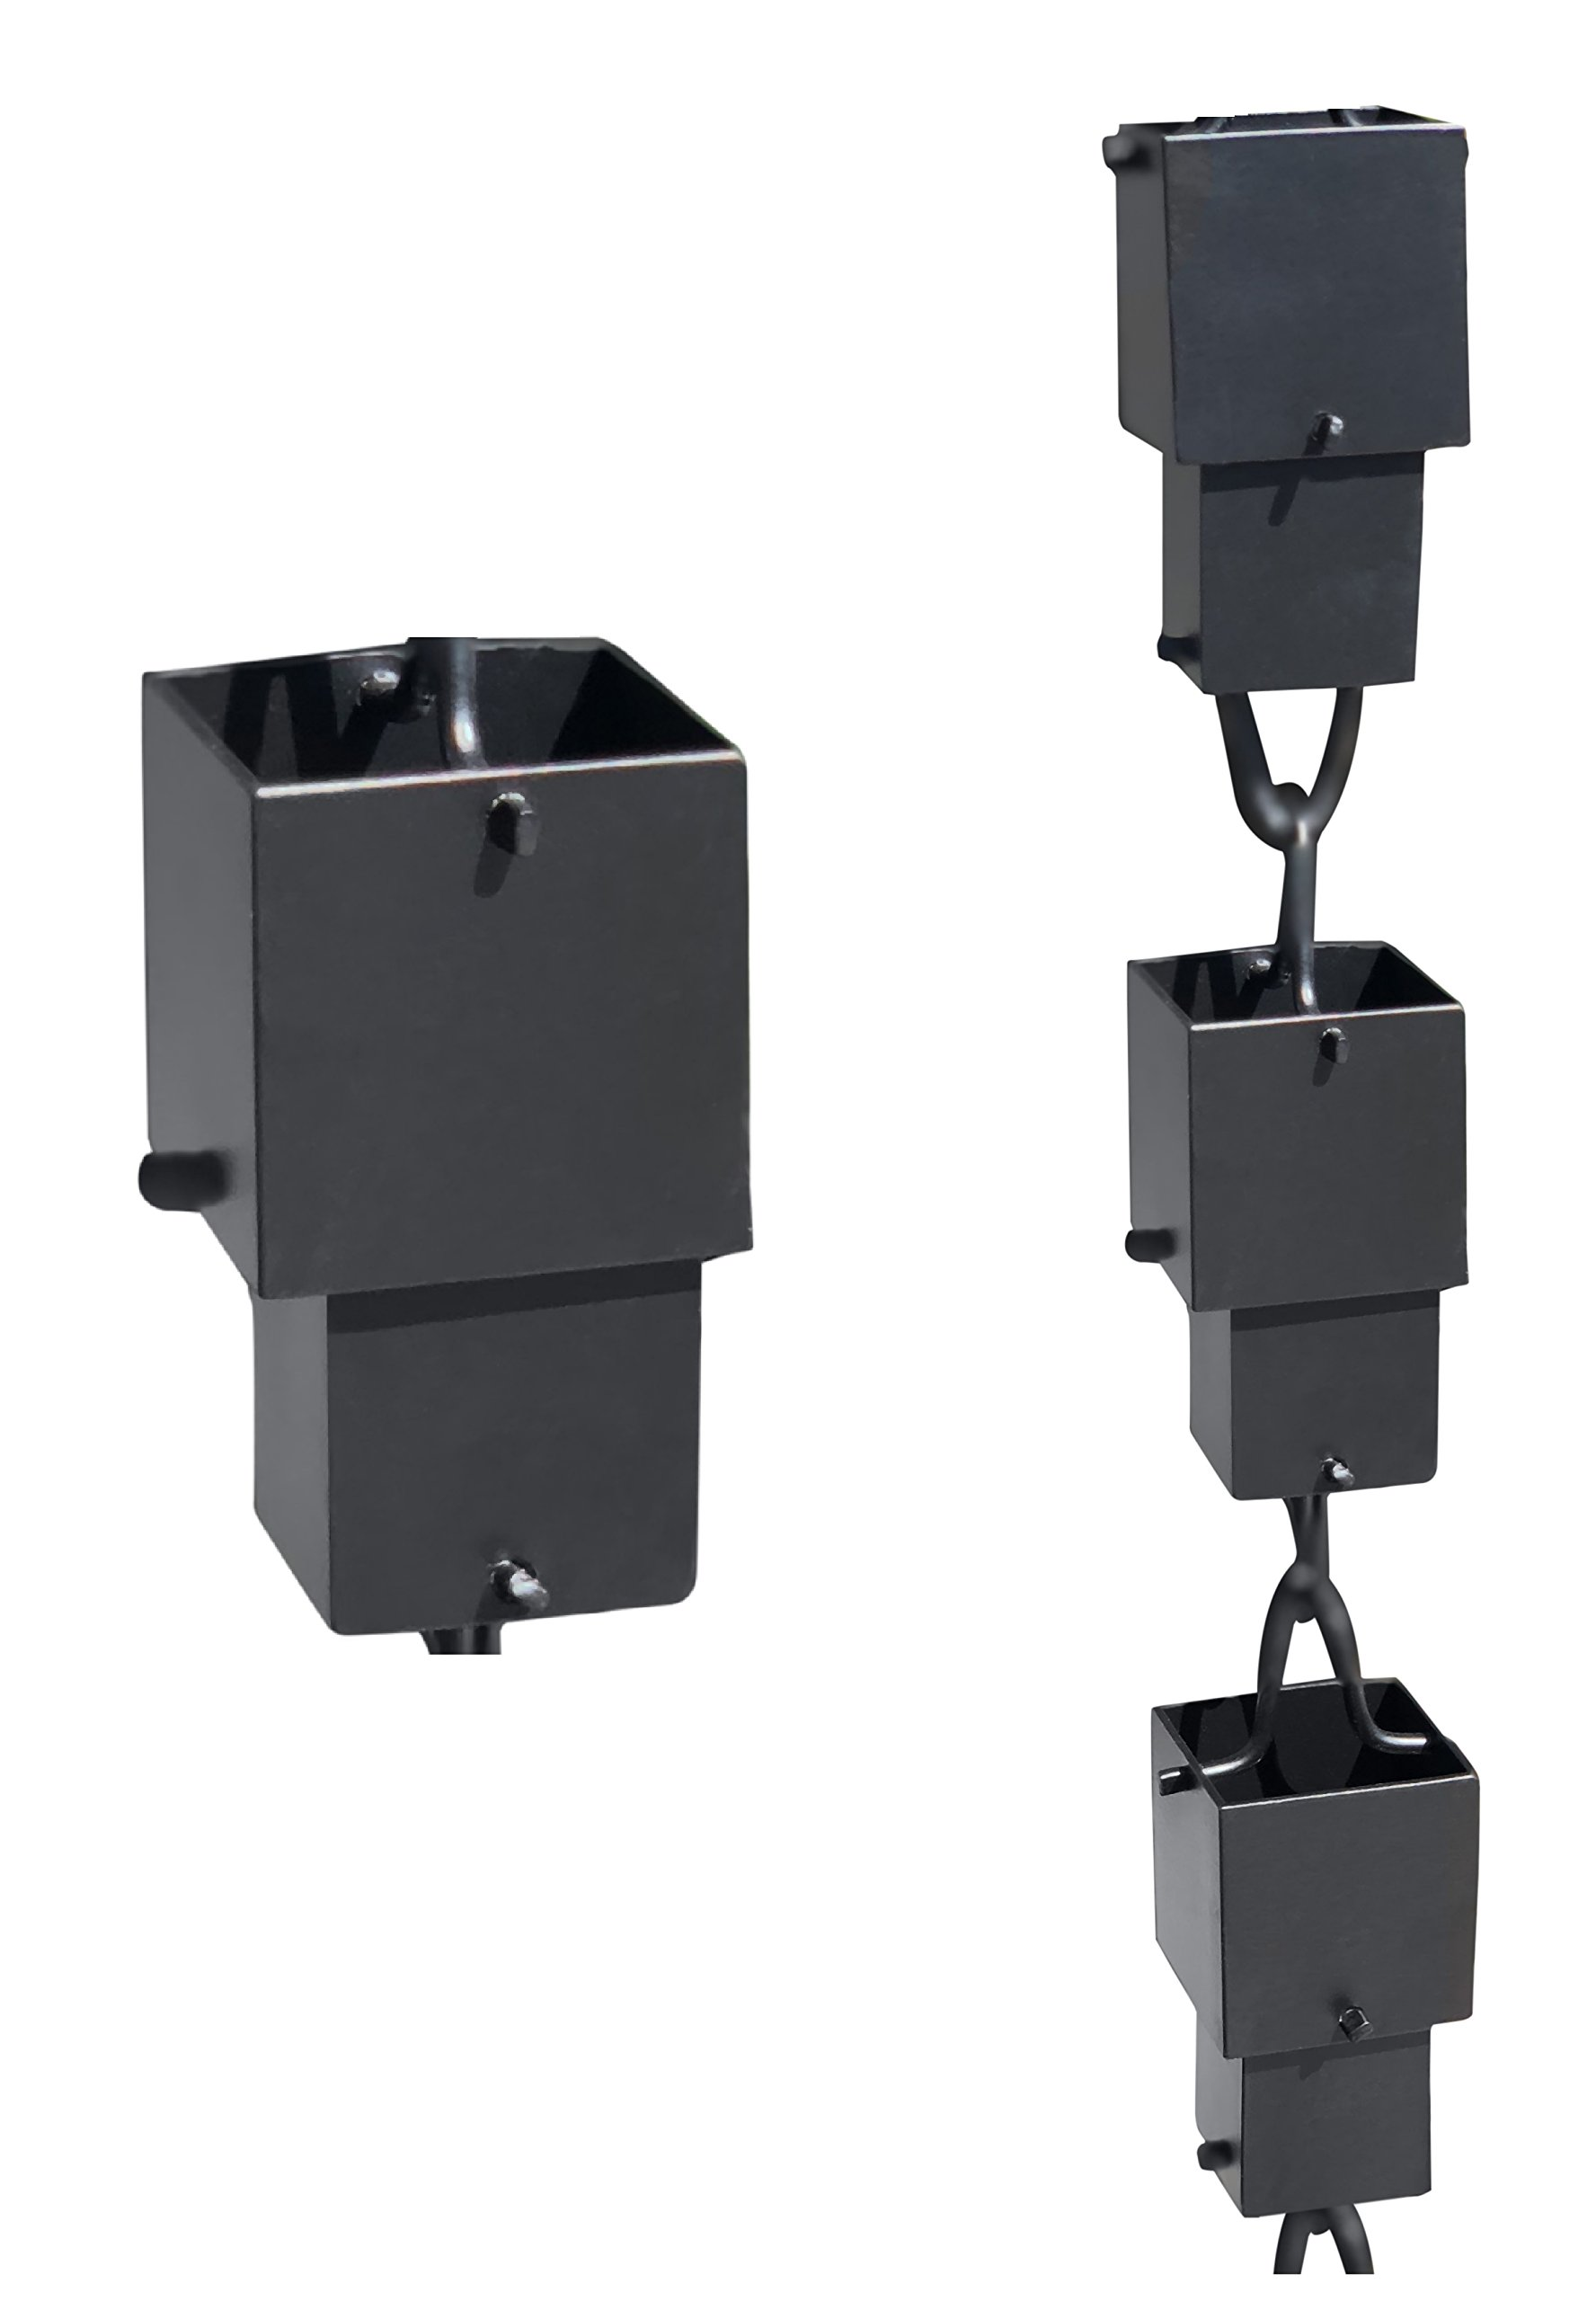 Monarch Aluminum Square Cups Rain Chain, 8-1/2 Feet Length (Black Powder Coated)